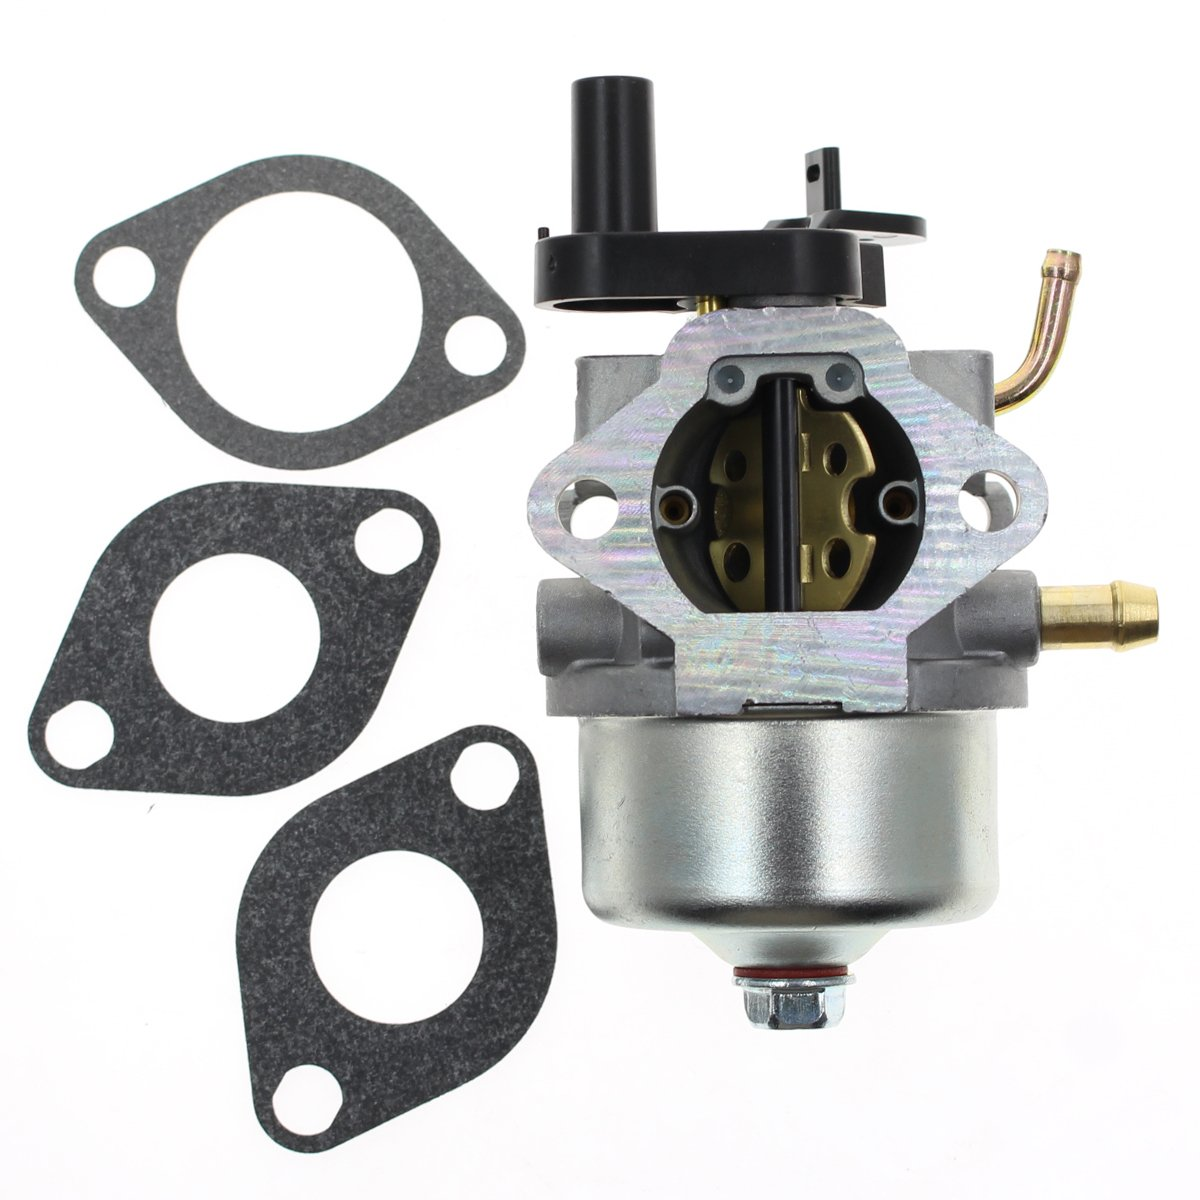 Carbhub Carburetor for Briggs & Stratton 801396 801233 801255 Snow Blower Carb by Carbhub (Image #2)